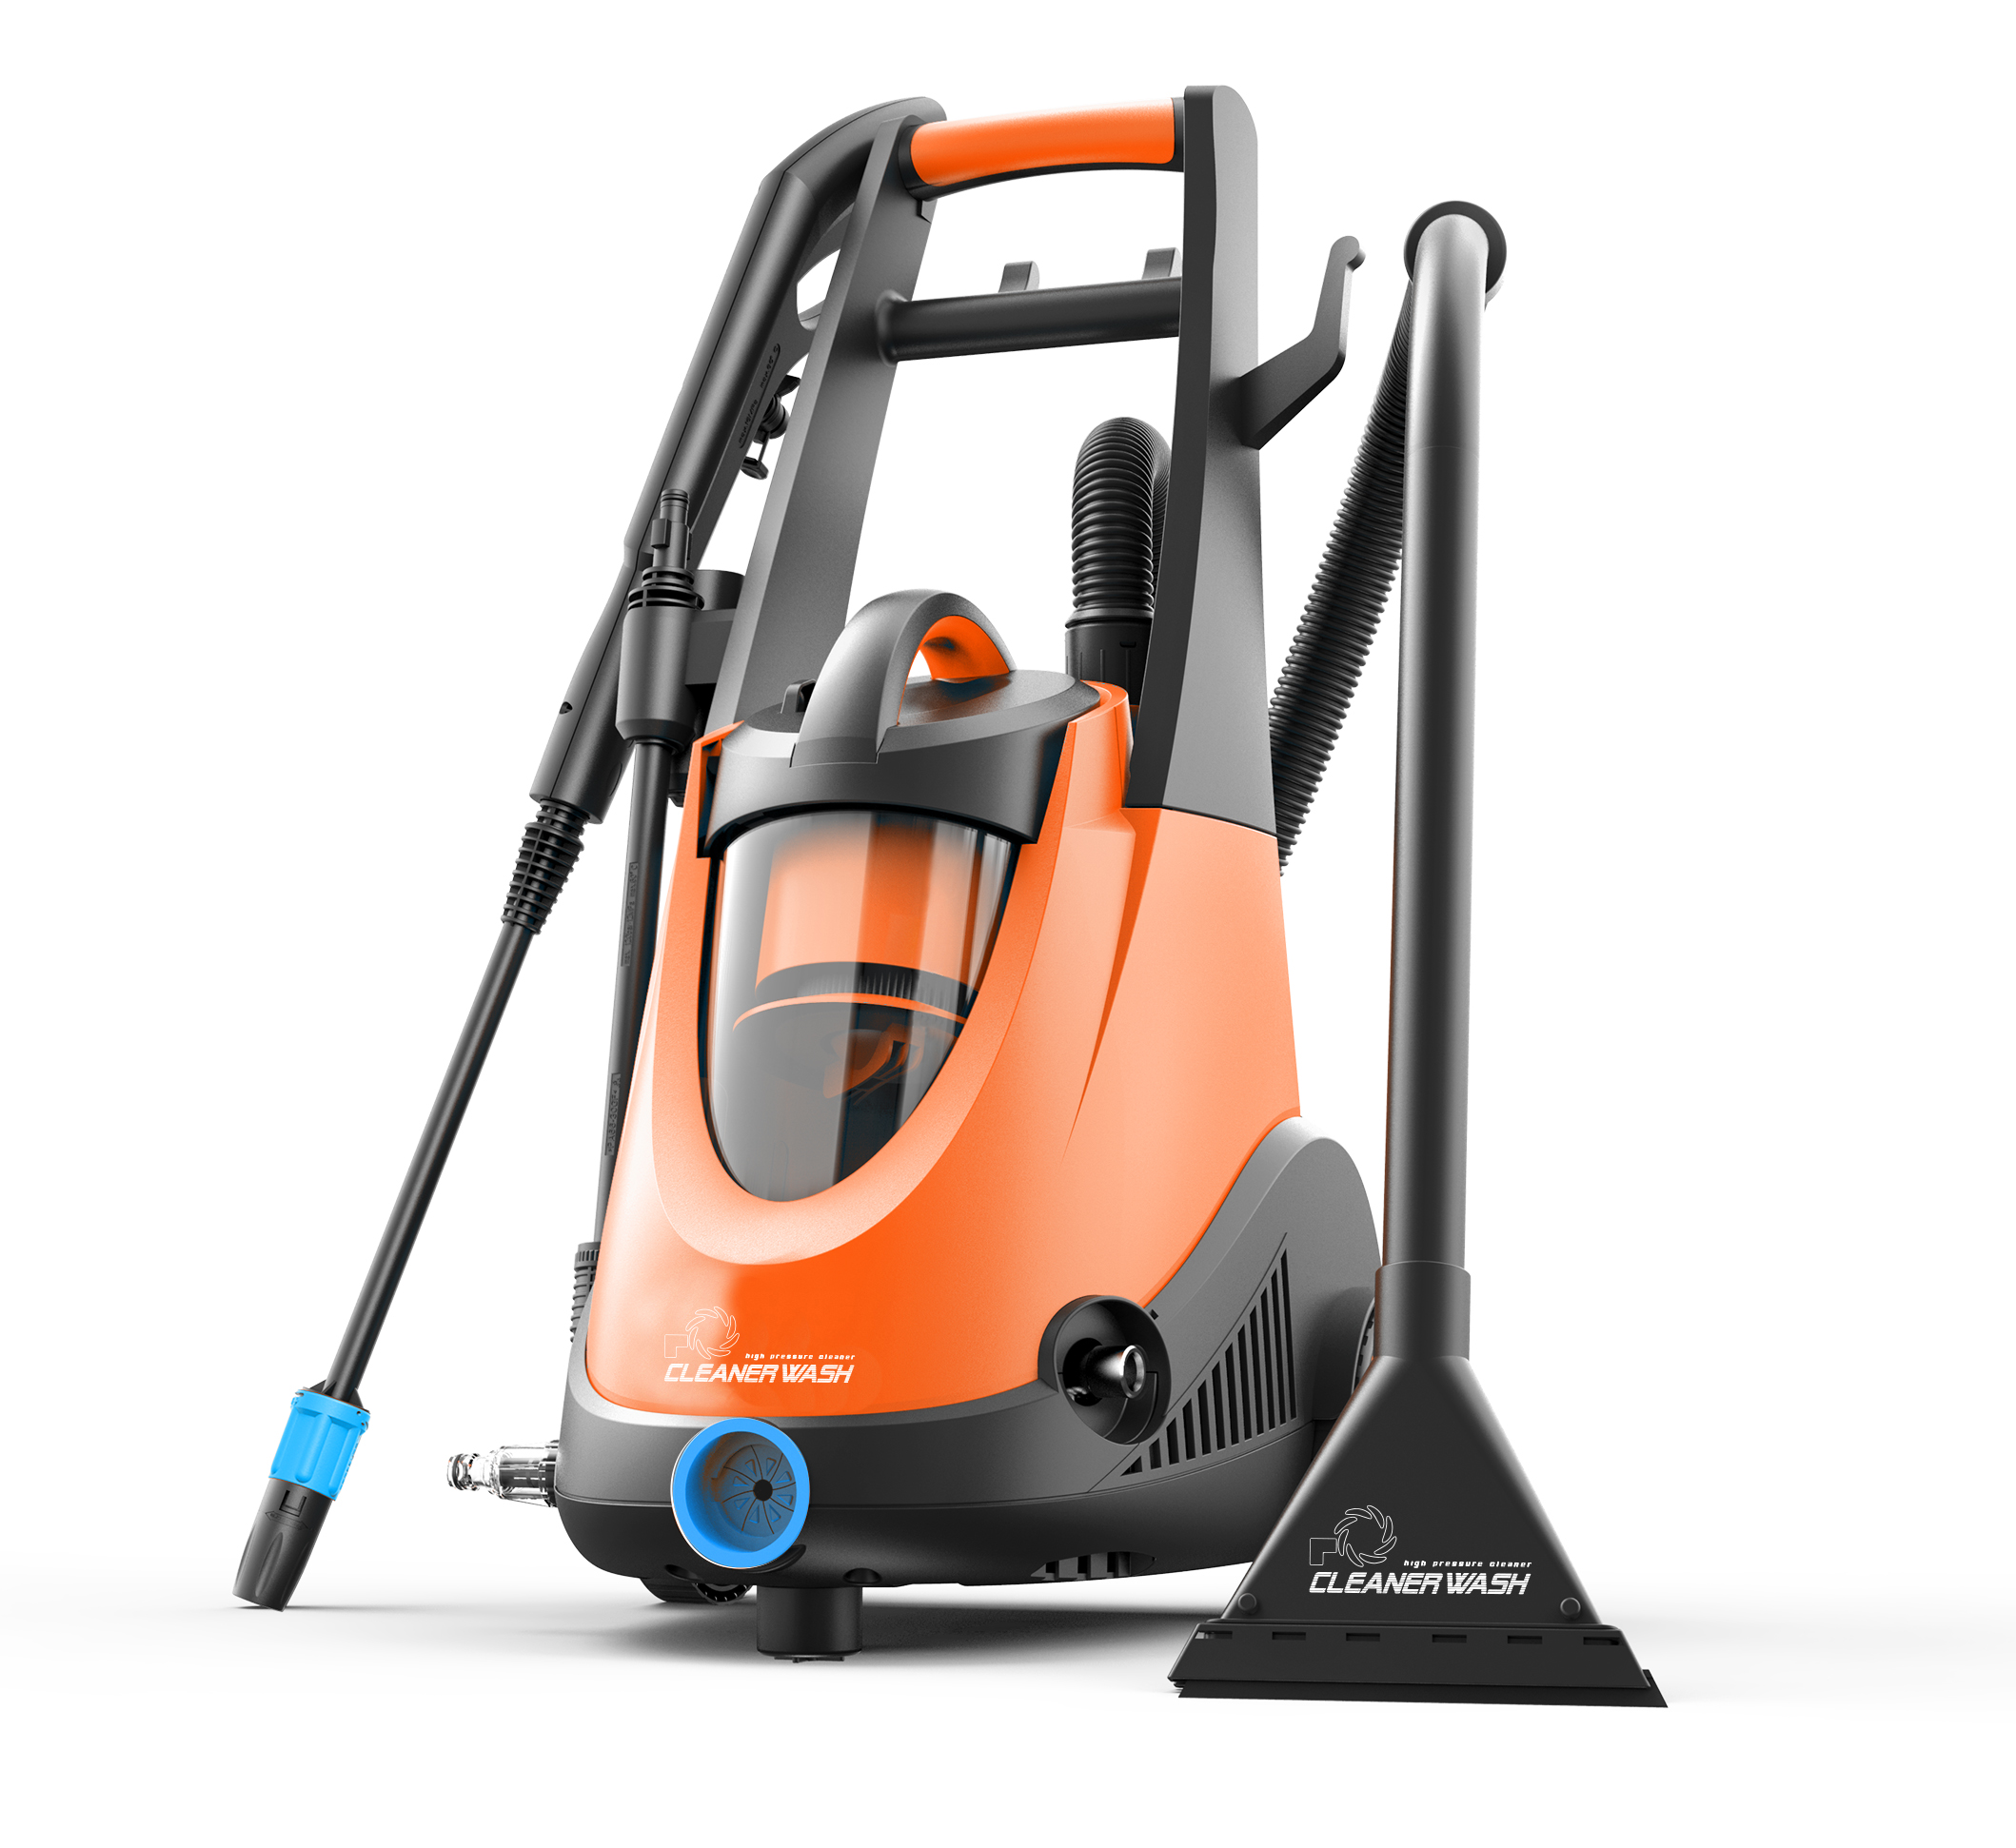 CLEANER WASH Idropulitrice/Aspiraliquidi 100Bar